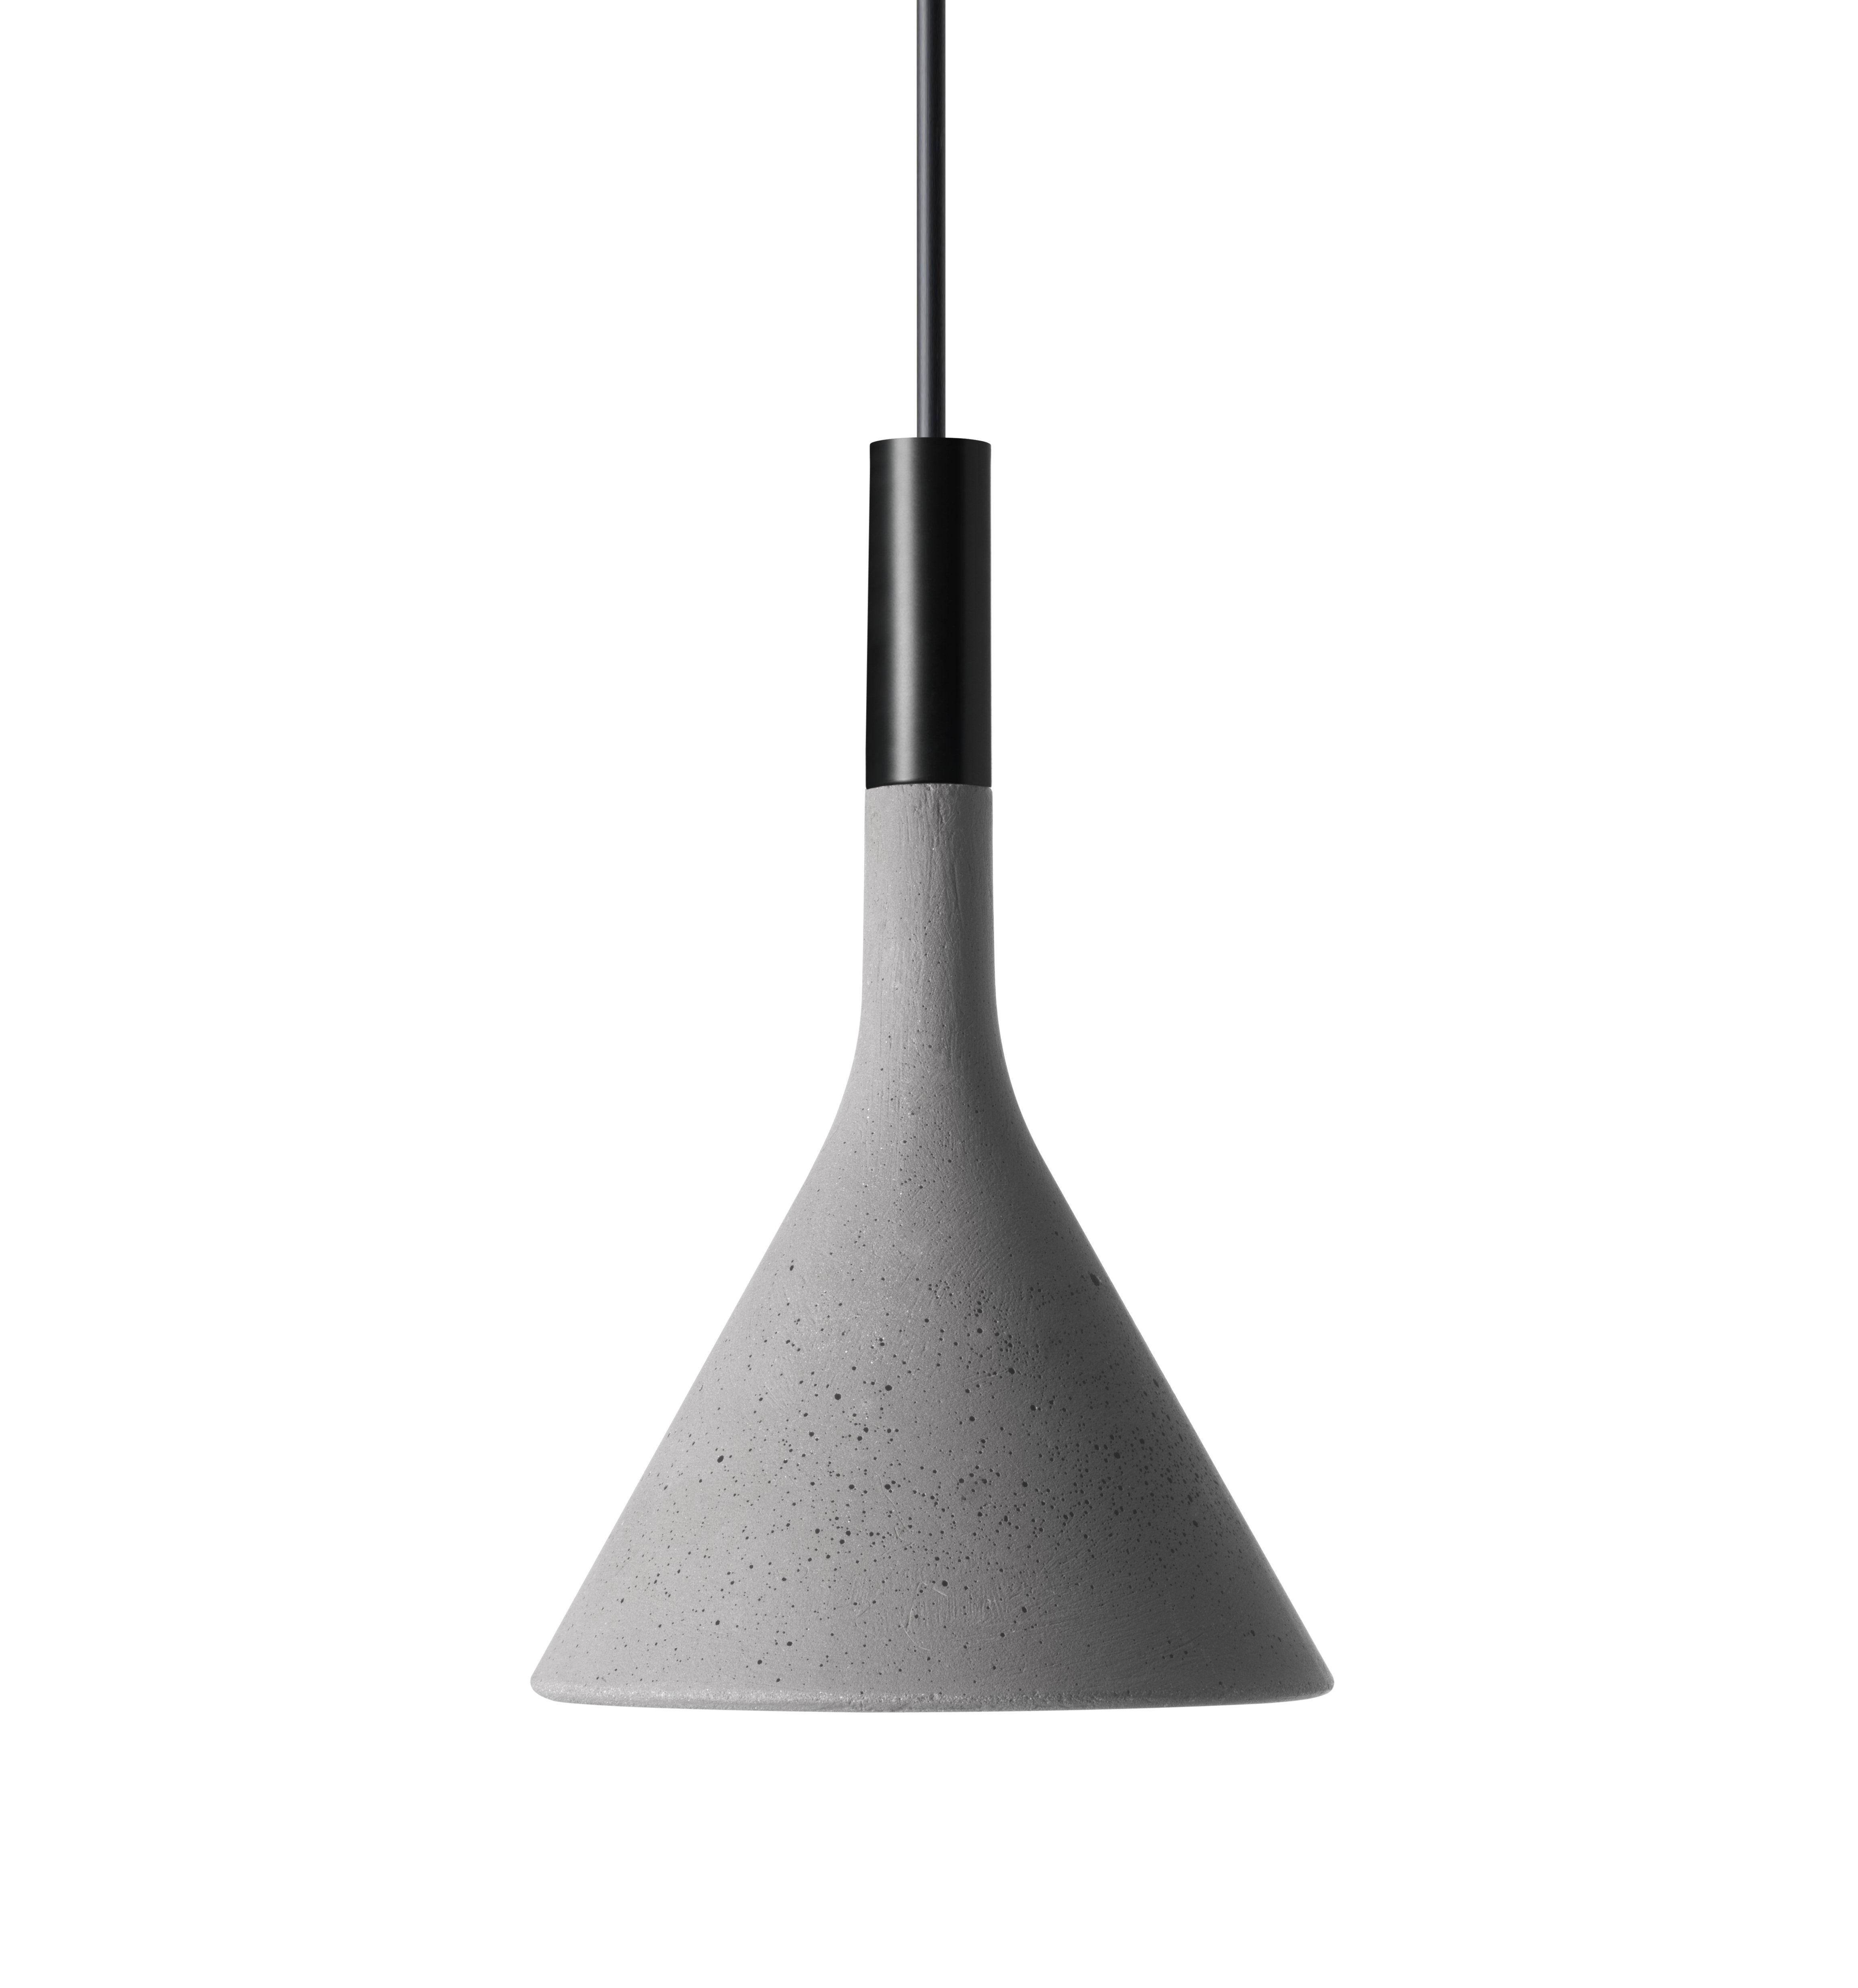 Leuchten - Pendelleuchten - Mini Aplomb Pendelleuchte / Beton - H 21 cm - Foscarini - Zementgrau - Zement